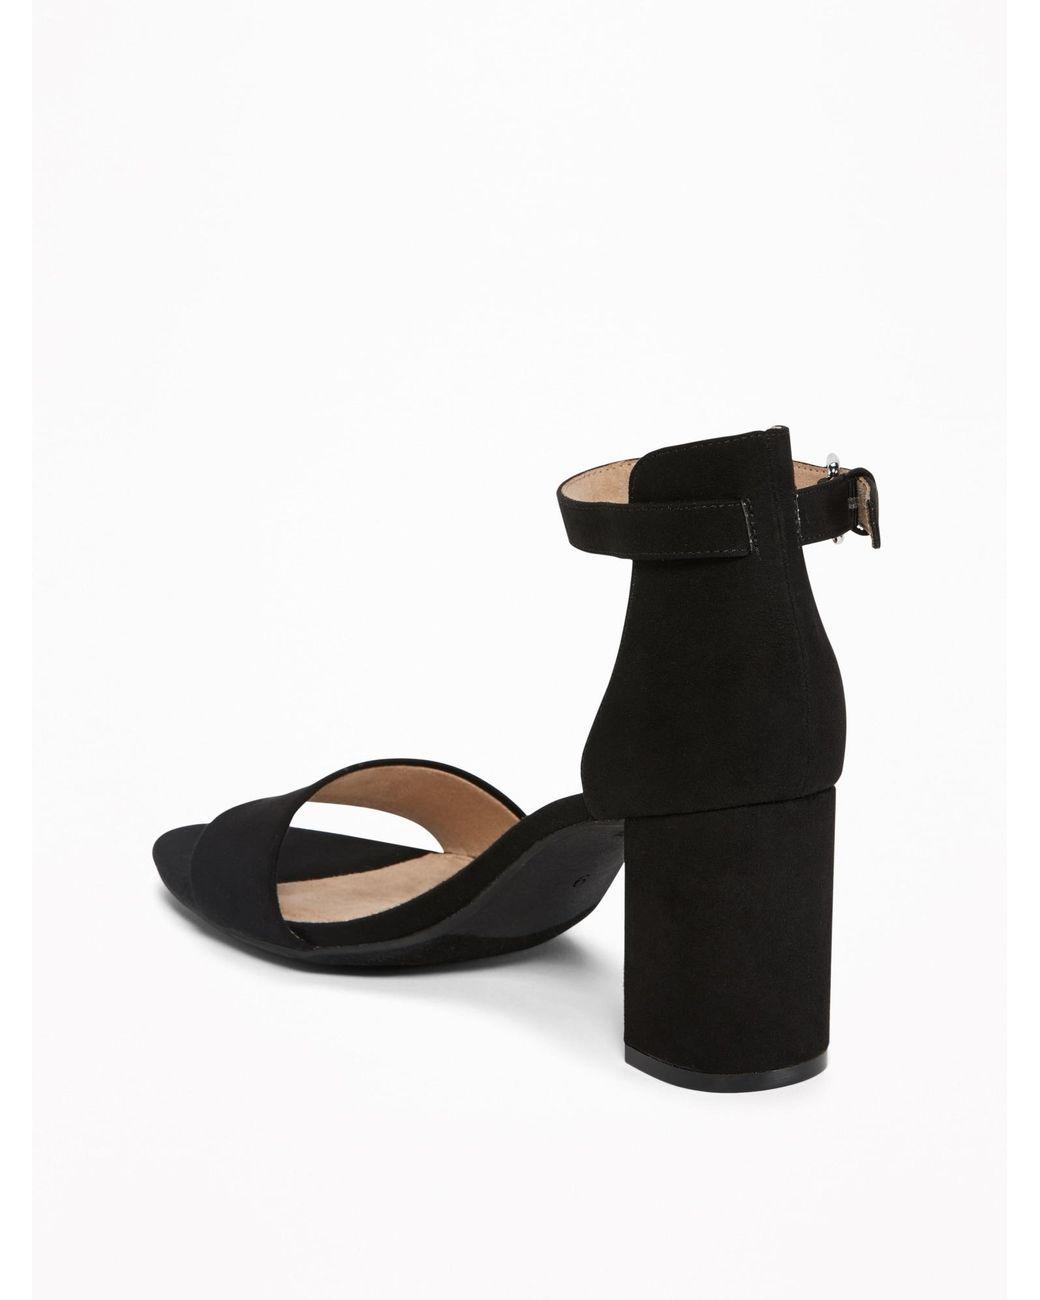 d5ab643df398 Lyst - Old Navy Faux-suede Block-heel Sandals in Black